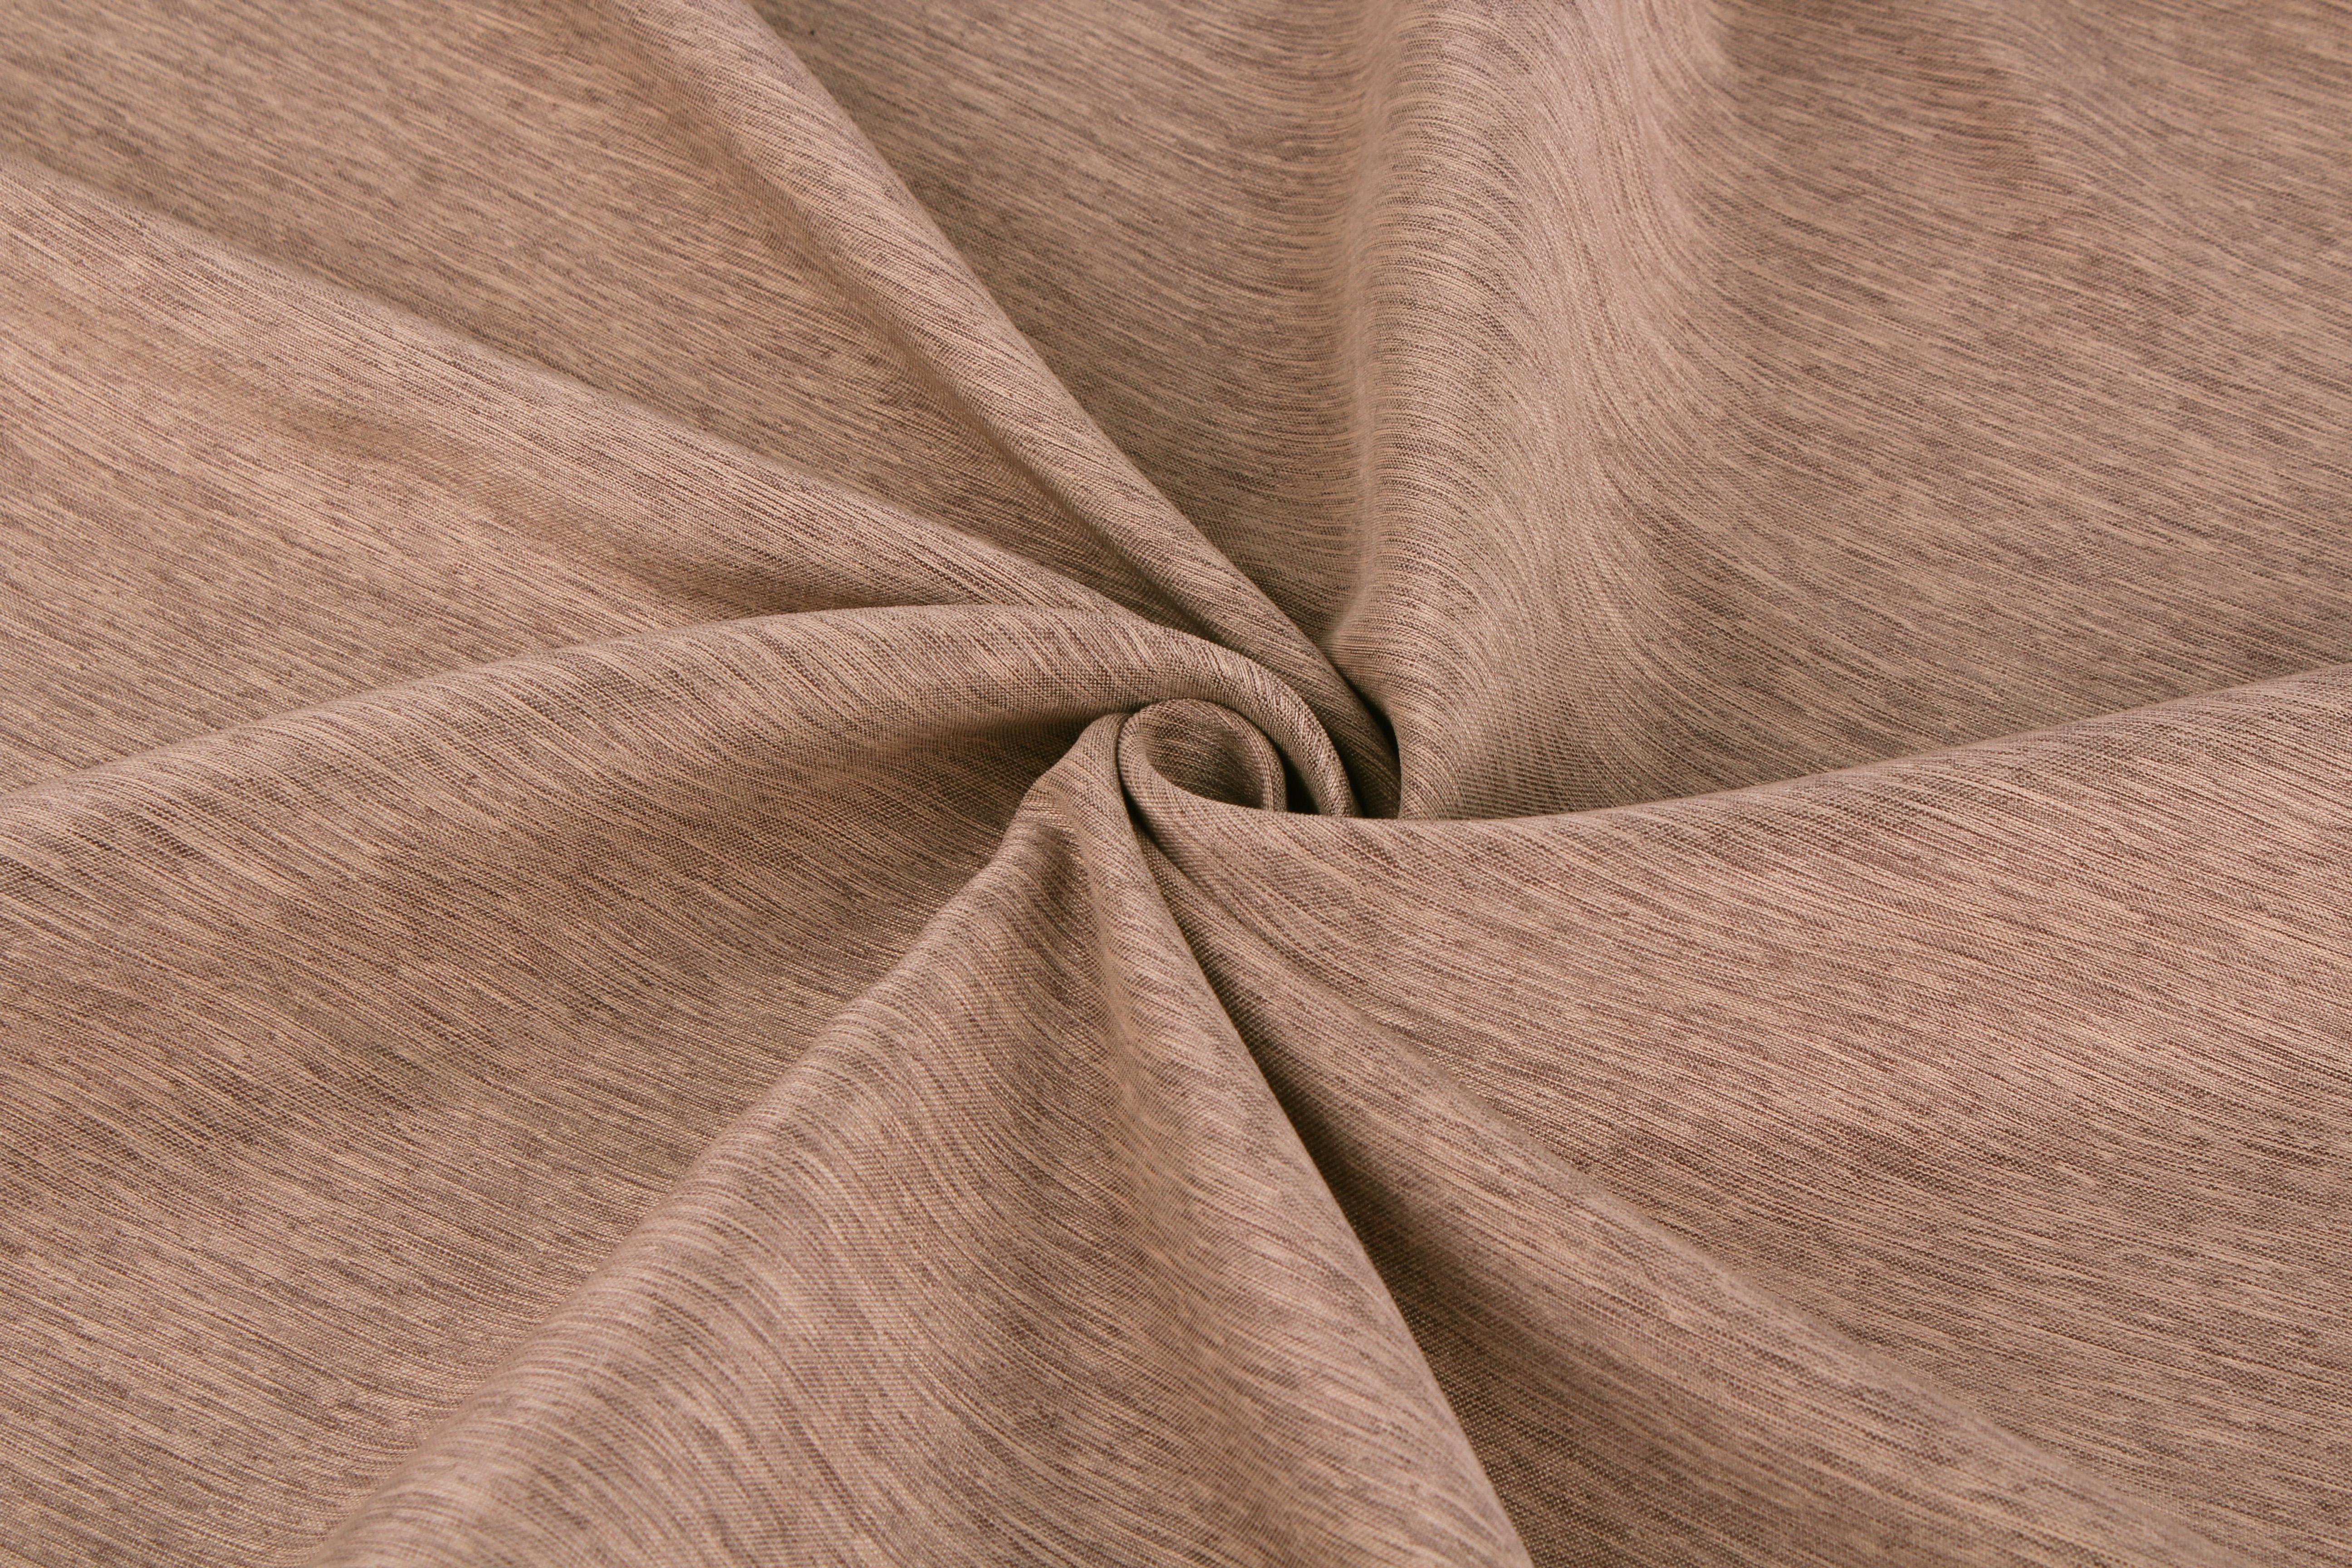 {} TexRepublic Материал Портьерная ткань Palette Цвет: Бежевый texrepublic материал портьерная ткань palette цвет брусничный